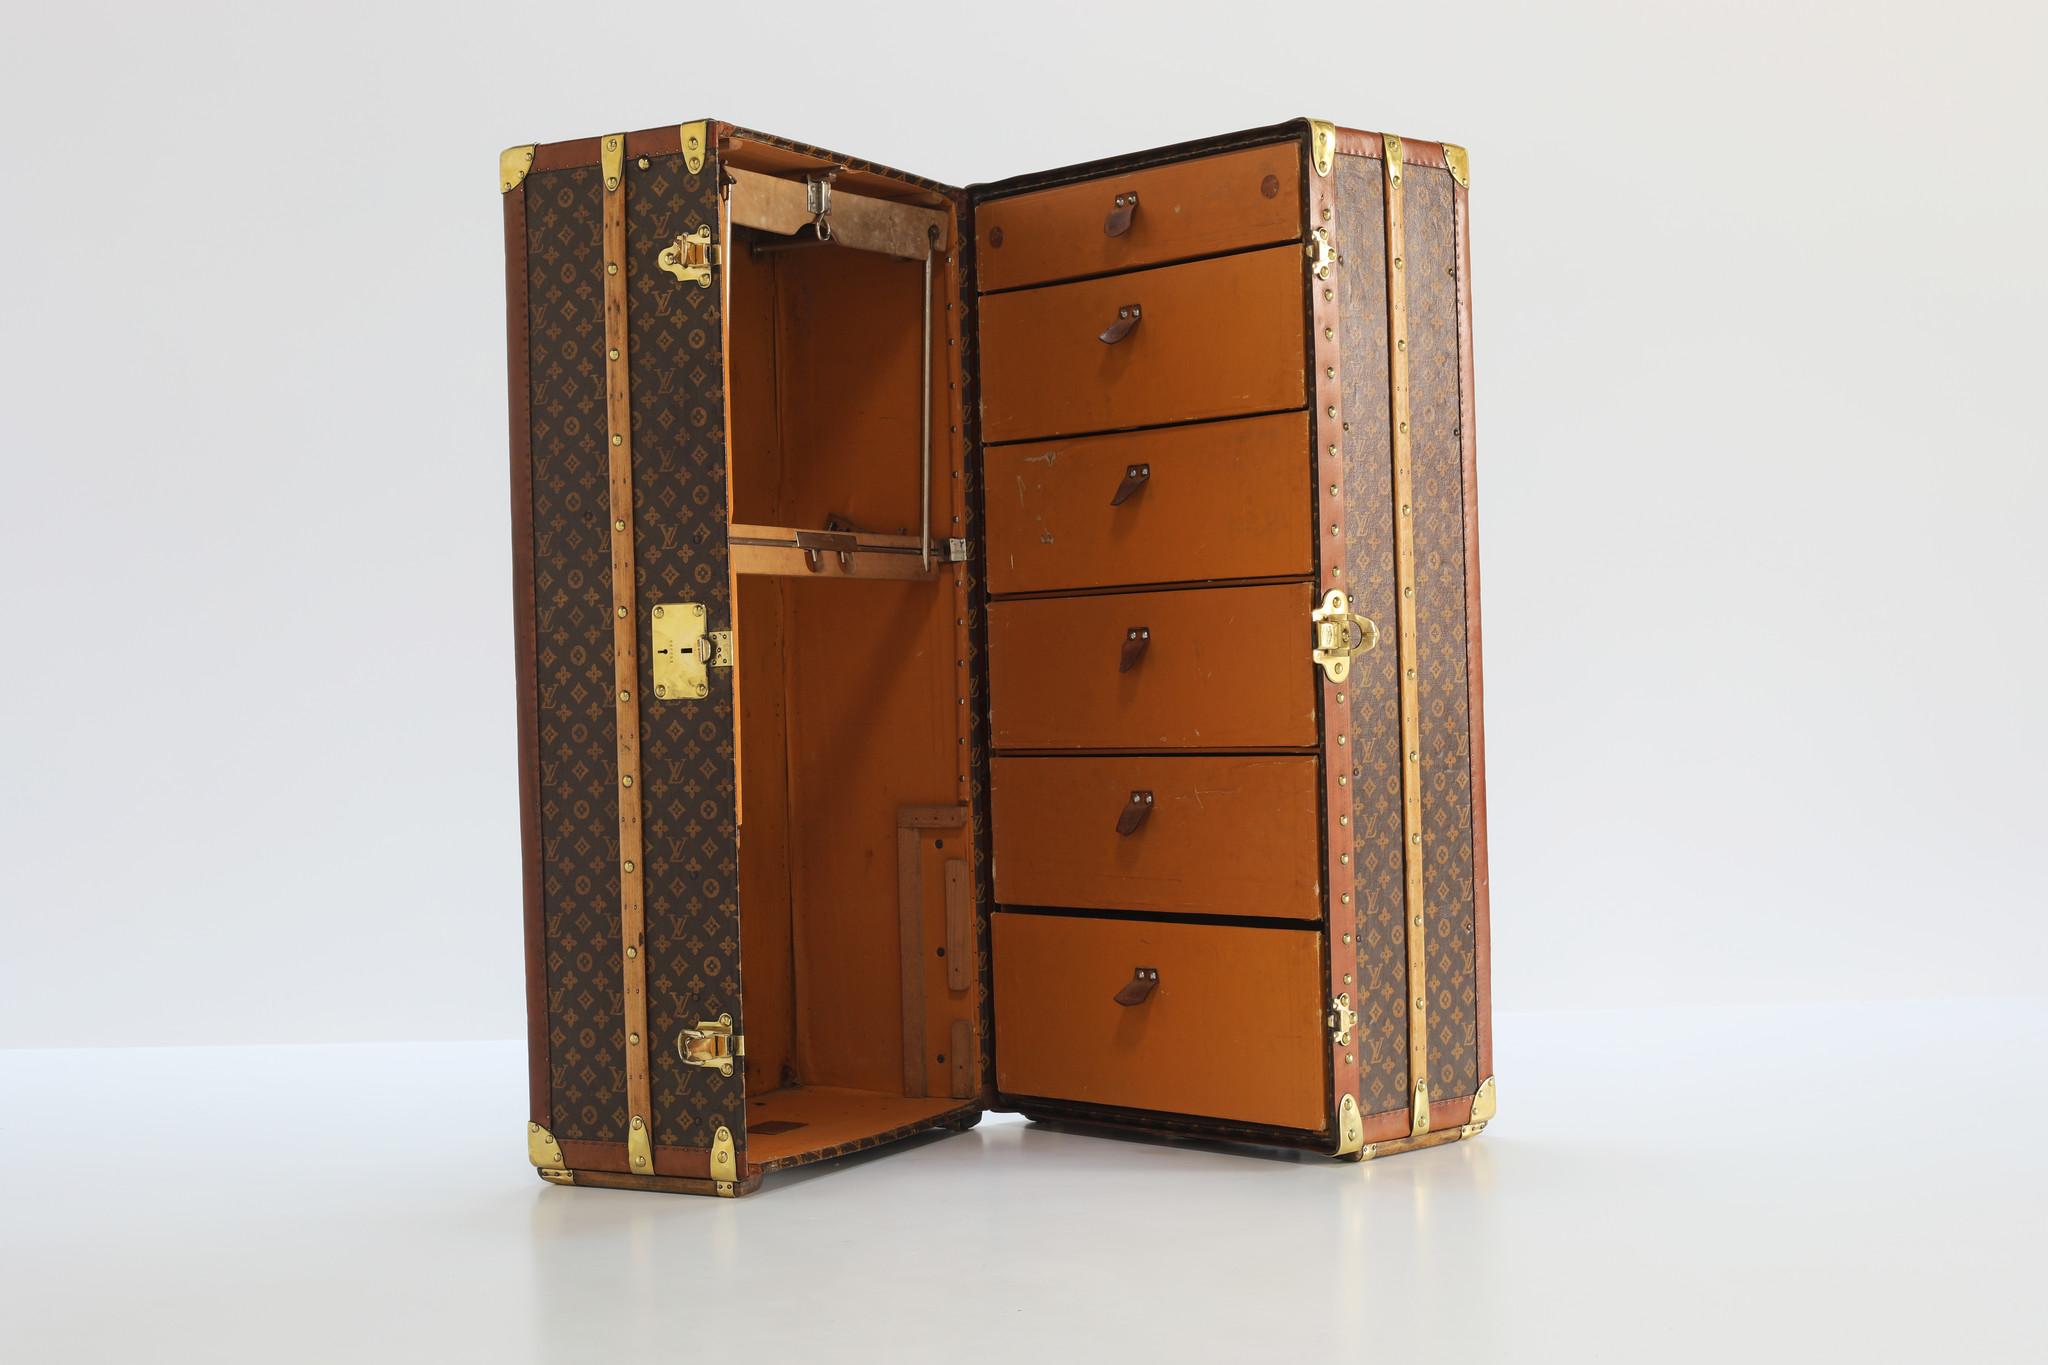 Louis Vuitton wardrobe, 1930s